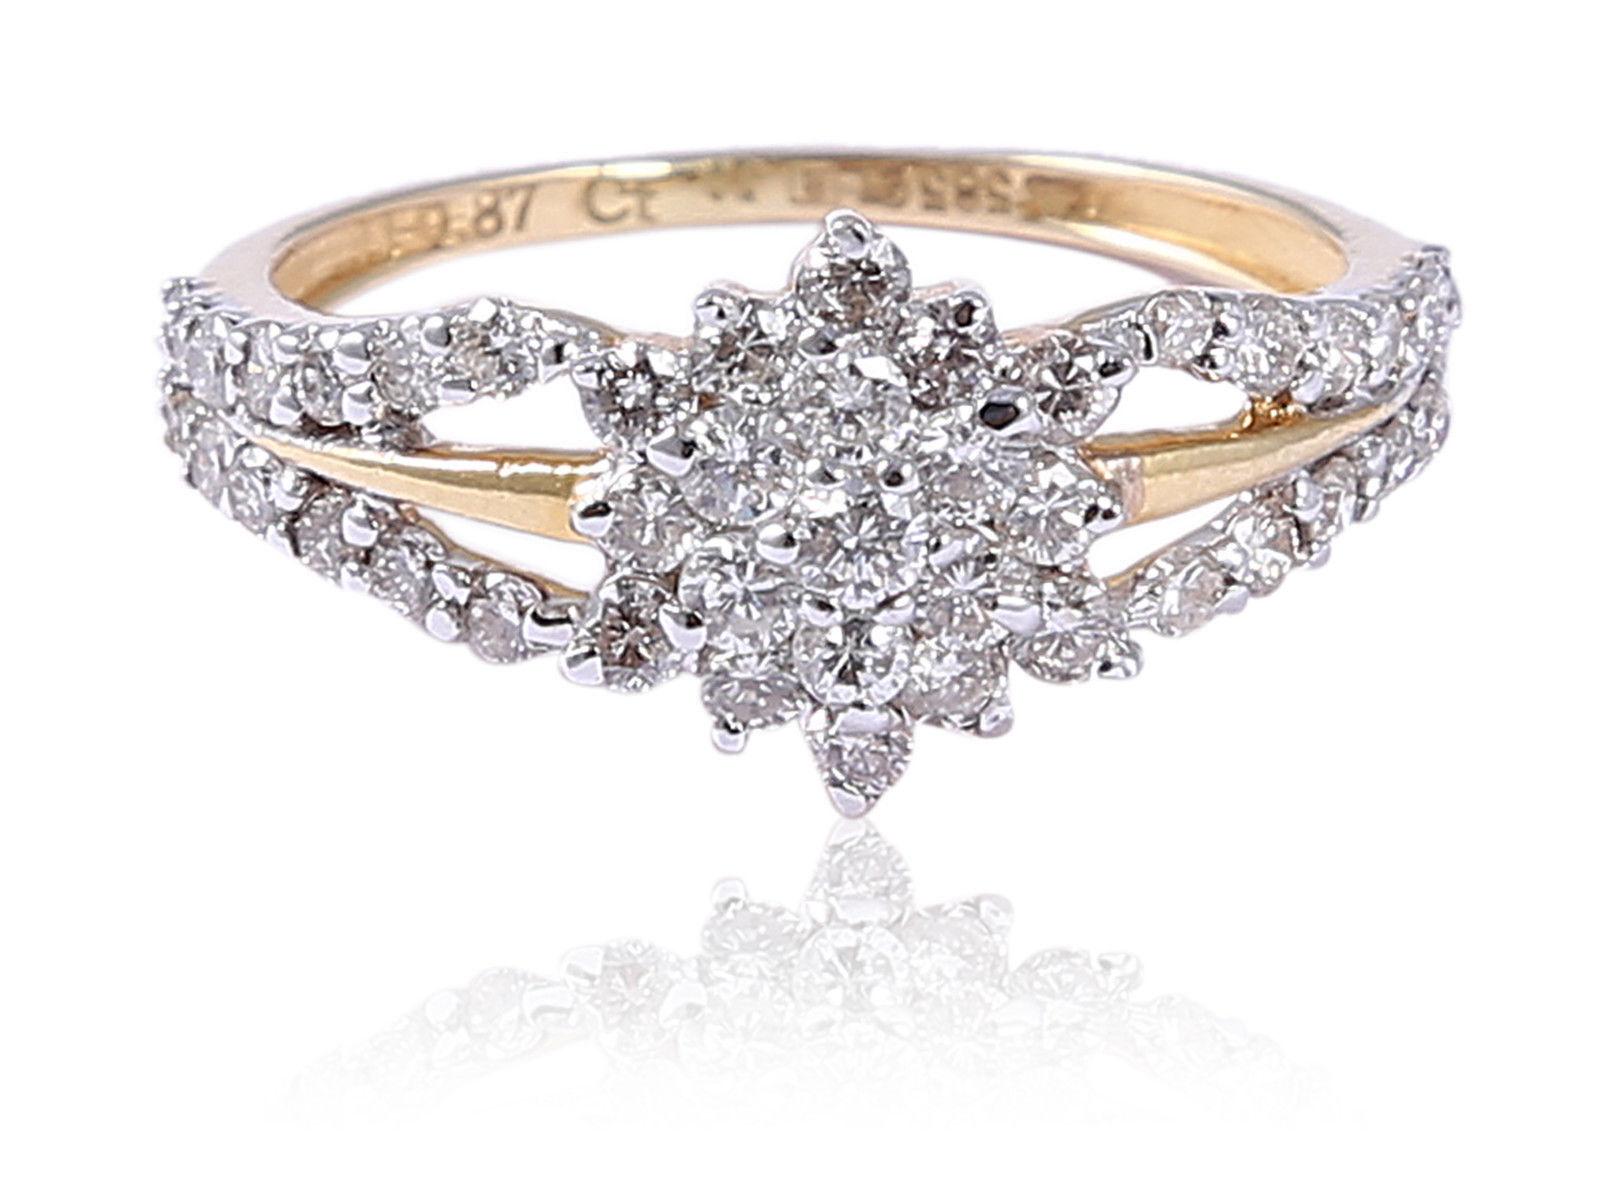 0.87 Cts Round Brilliant Cut Diamonds Anniversary Ring In Fine Hallmark 14K gold